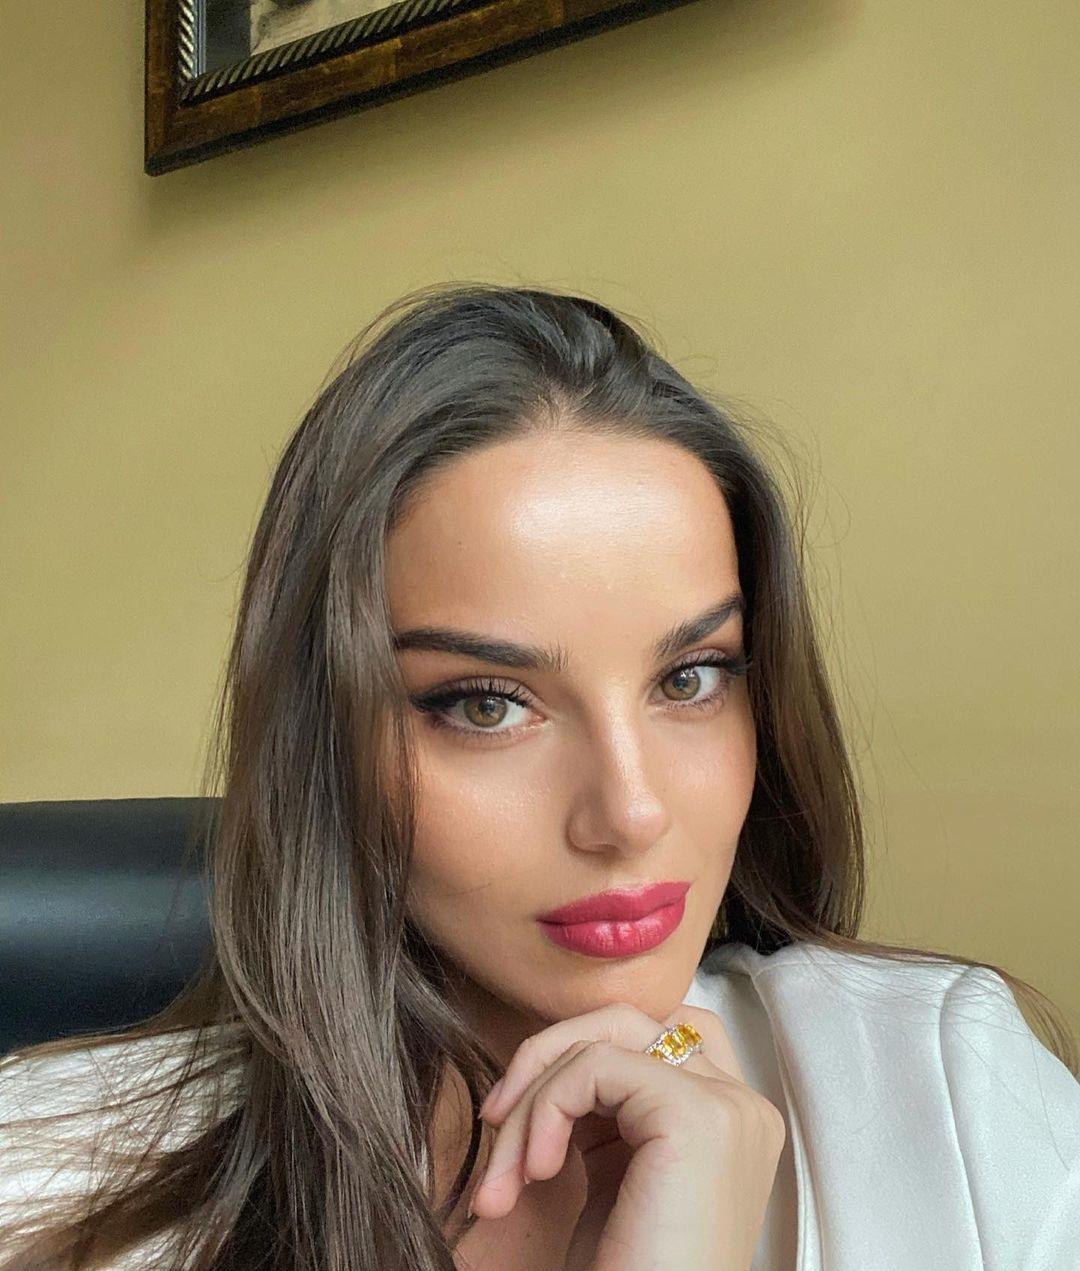 Mariam-Mdzevashvili-Wallpapers-Insta-Fit-Bio-7